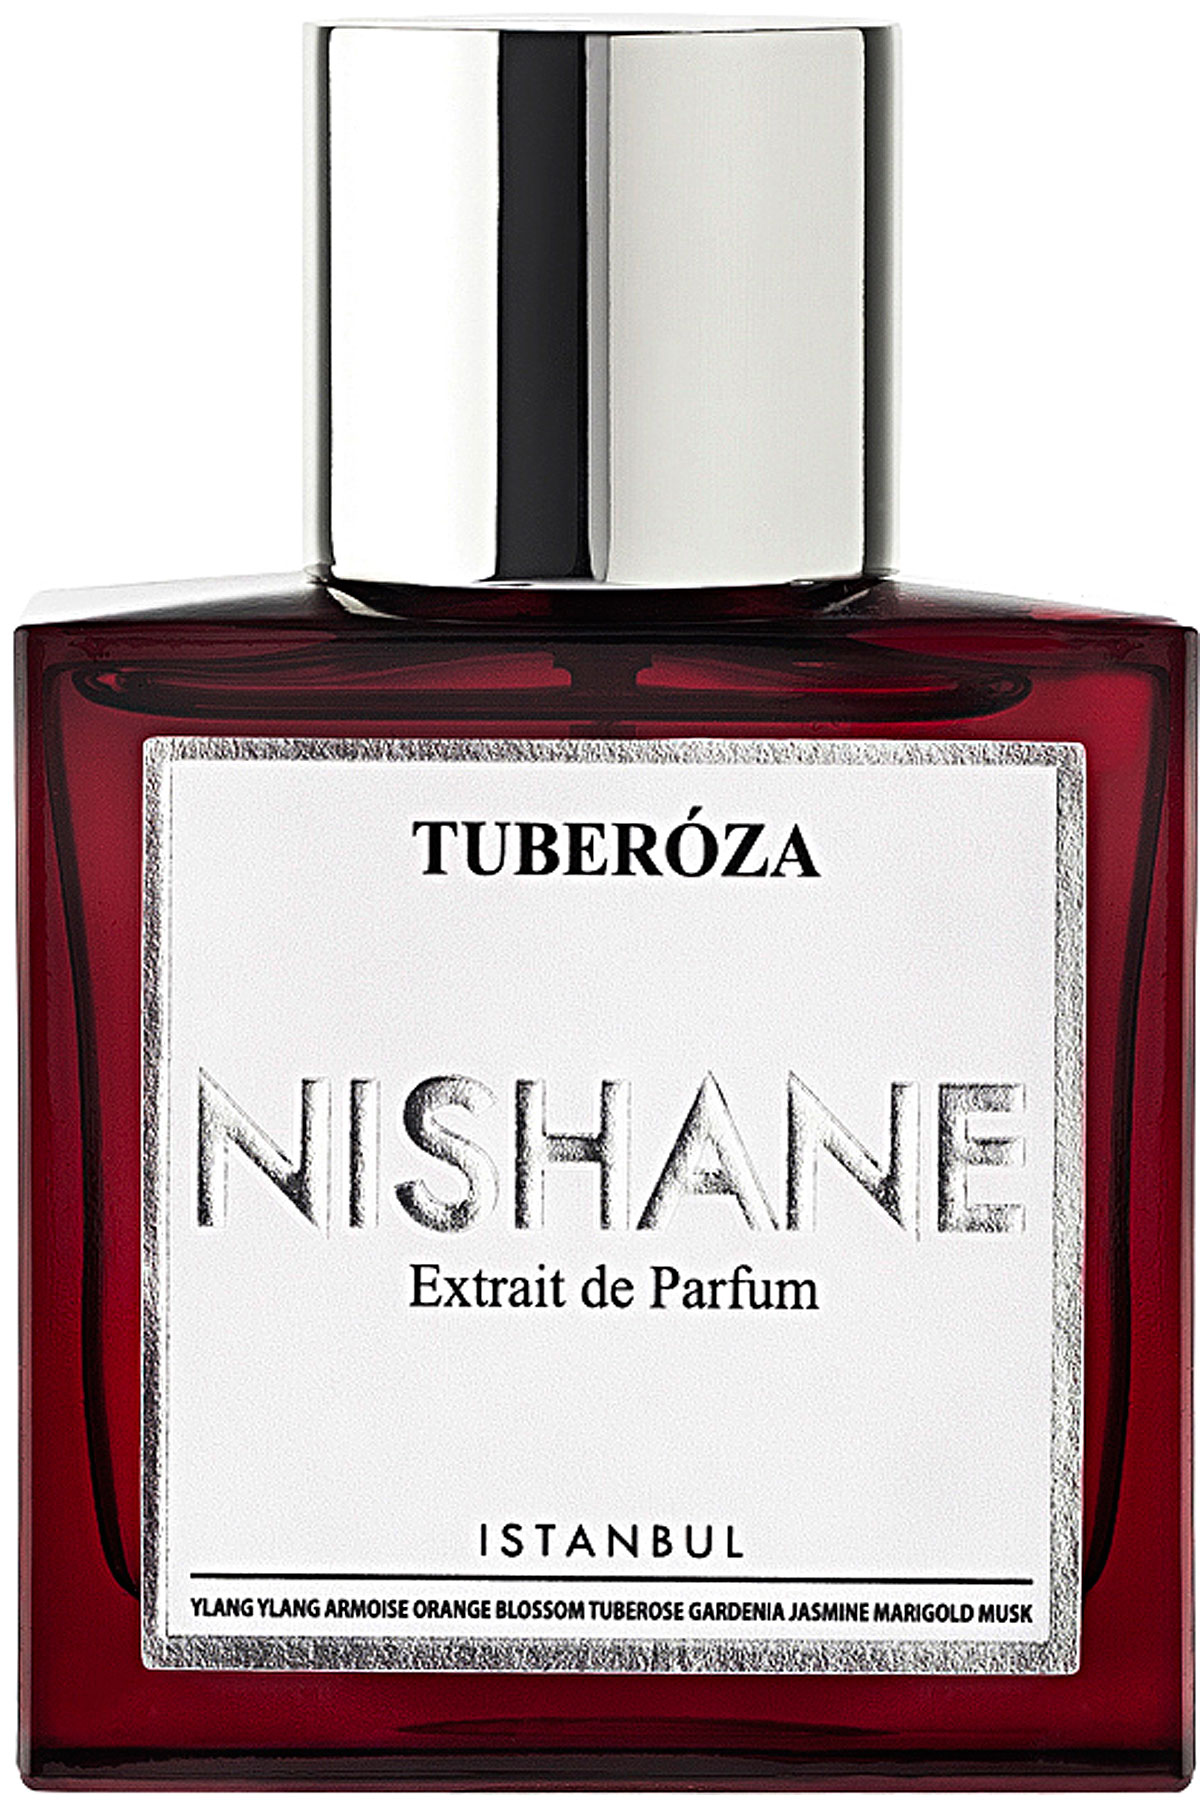 Nishane Fragrances for Men, Tuberoza - Extrait De Parfum - 50 Ml, 2019, 50 ml